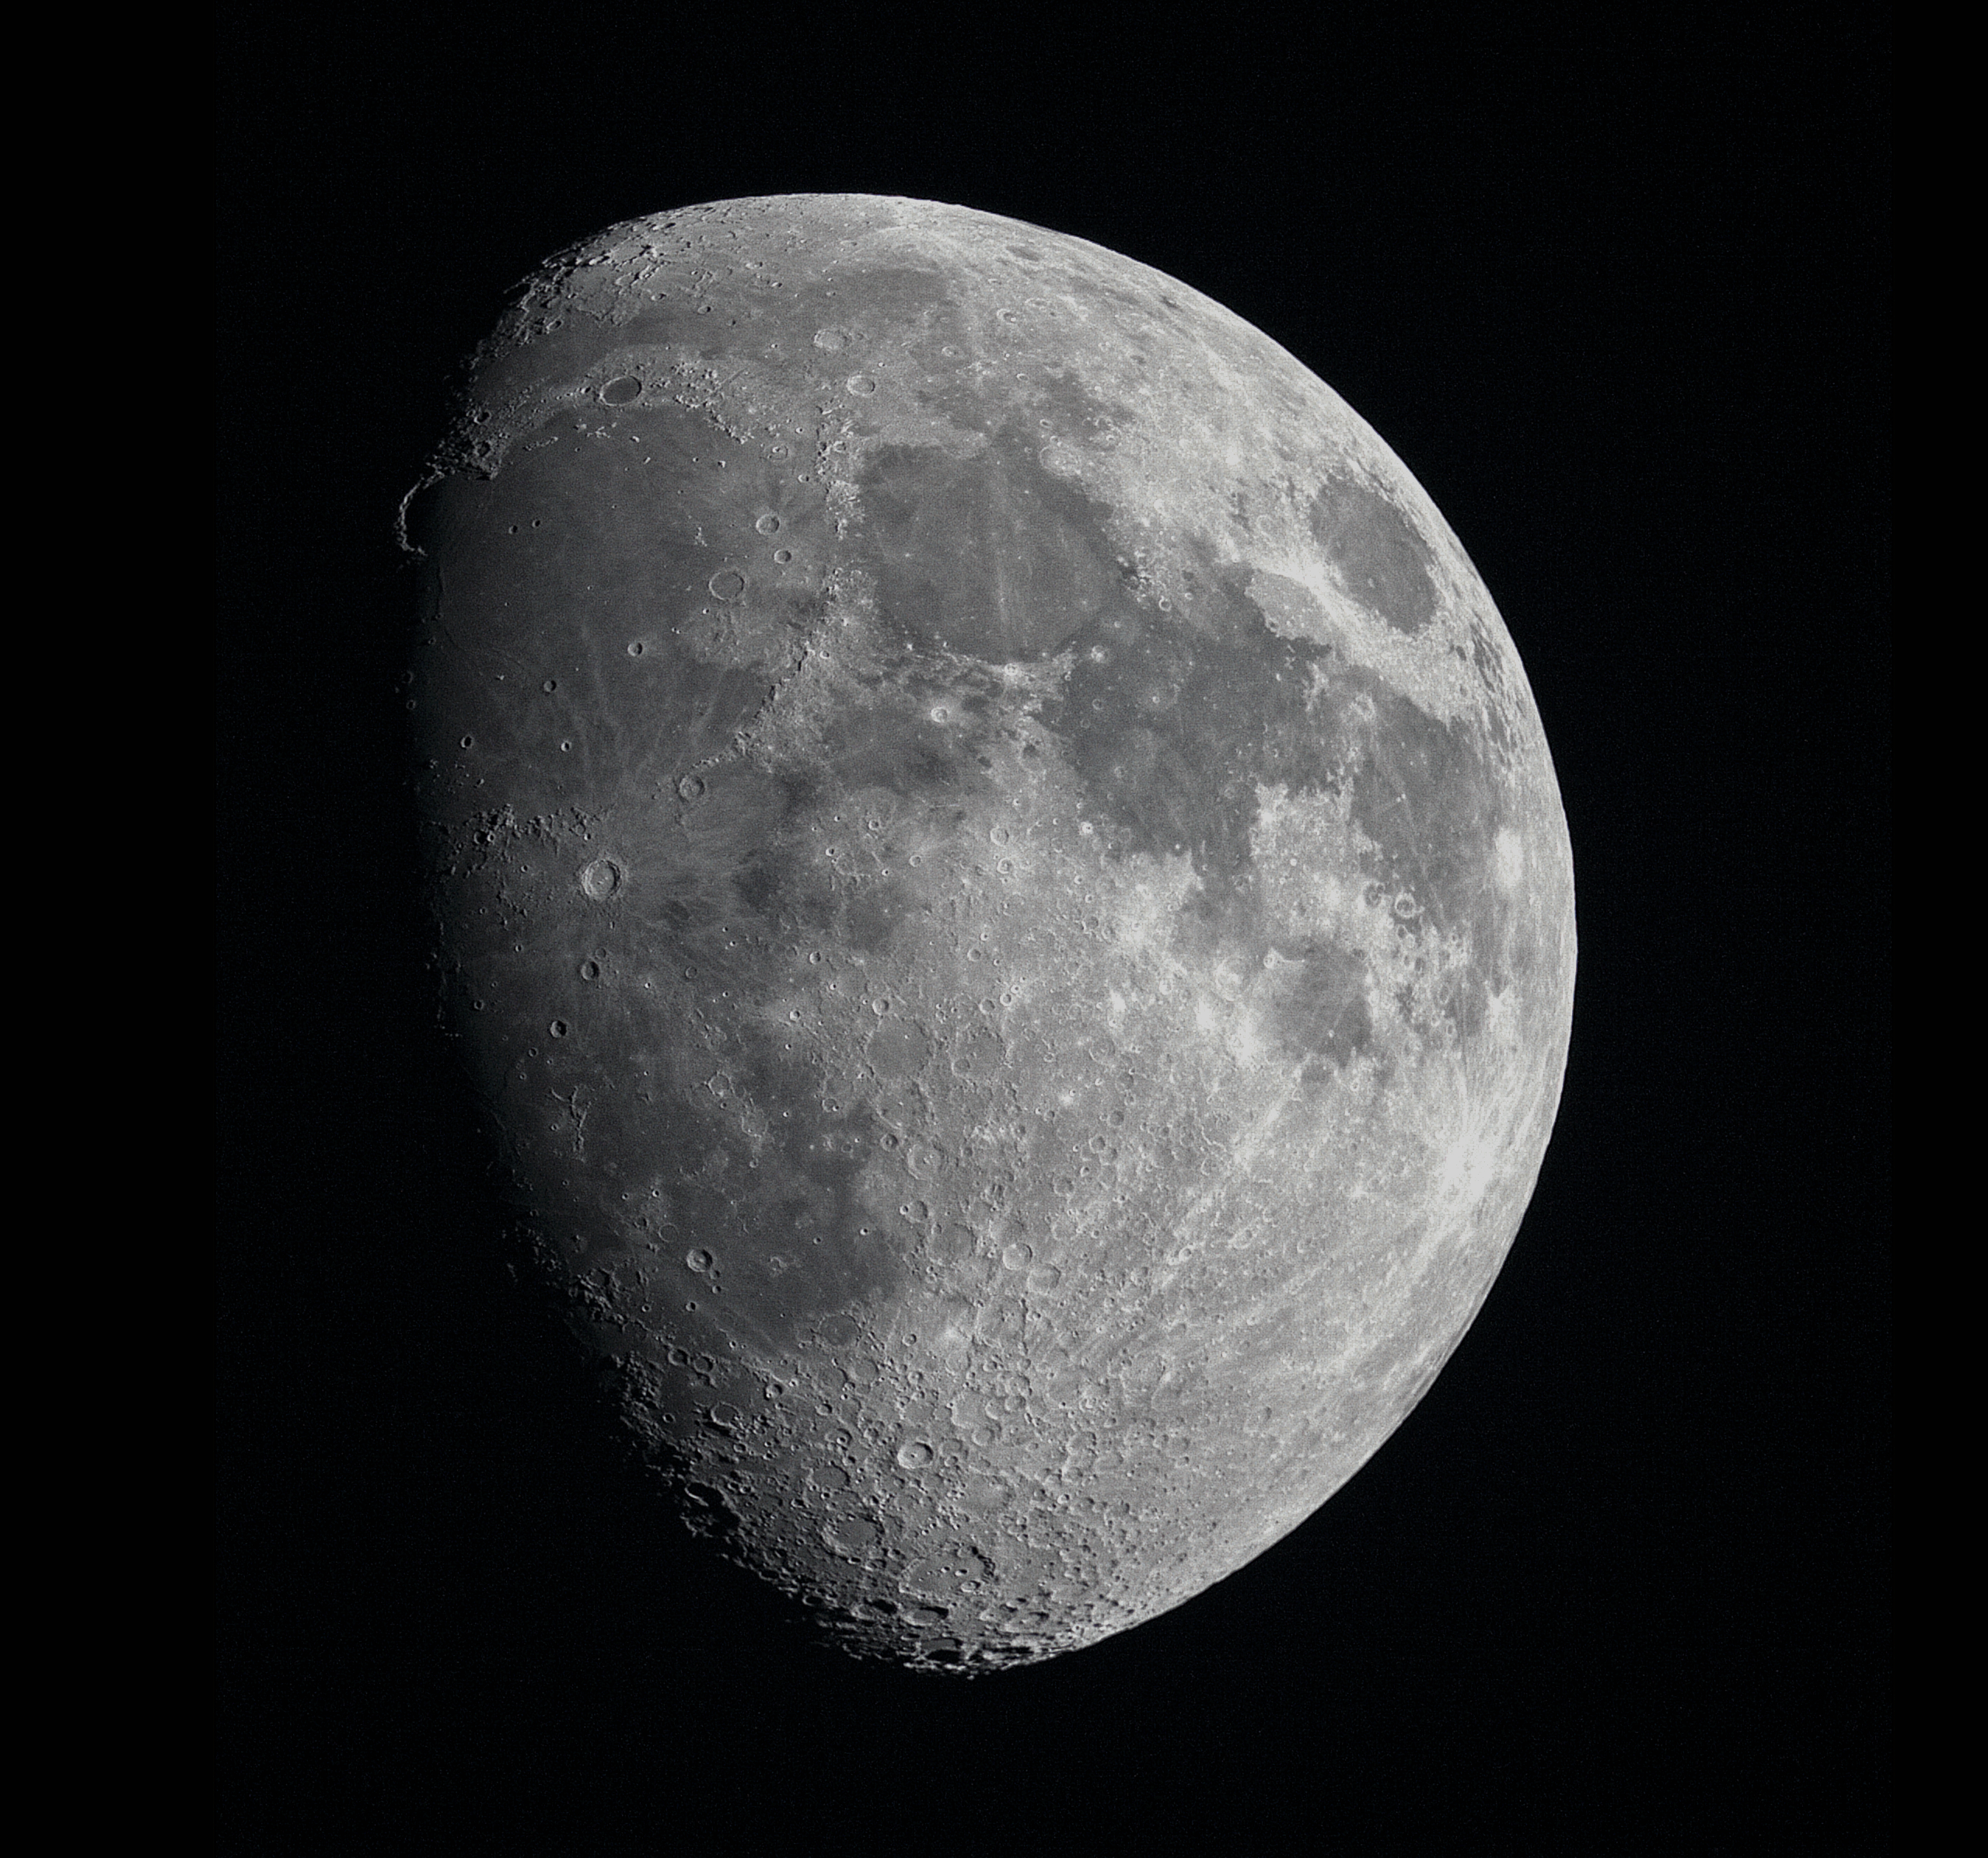 lune_samedi_16_mars_2019_2_iris_cc.png